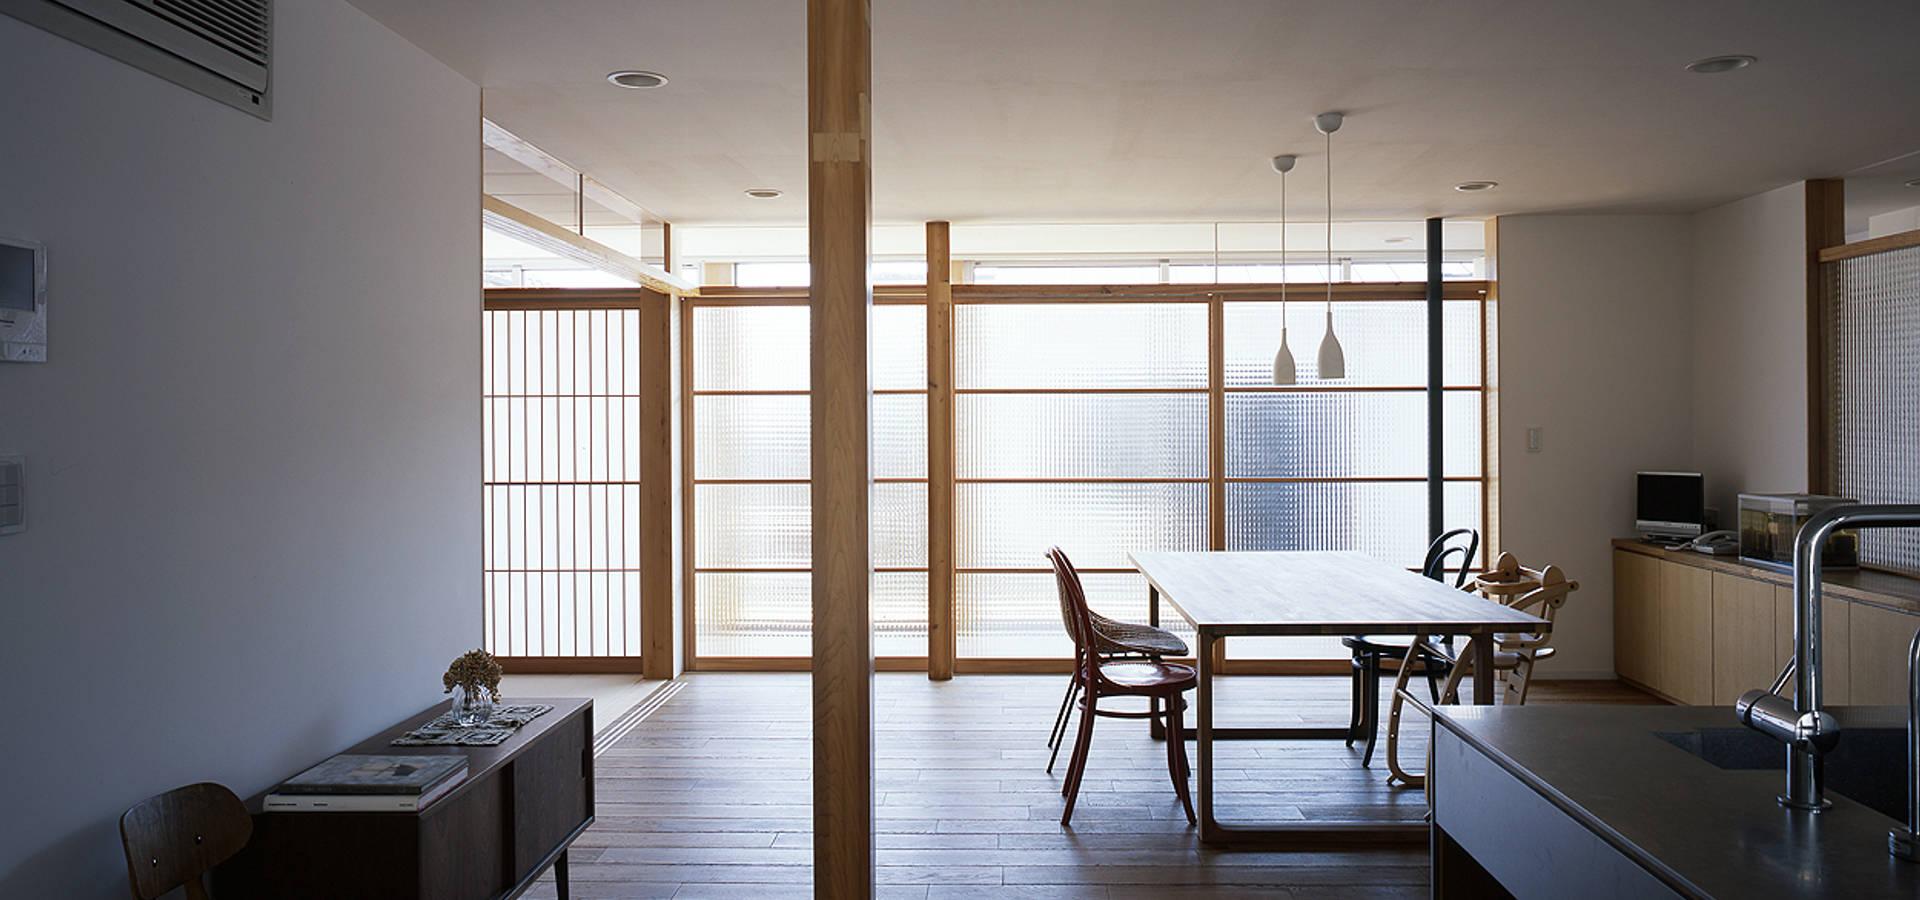 俵・小畠建築設計事務所  / Tawara・Obatake Architect & Associates